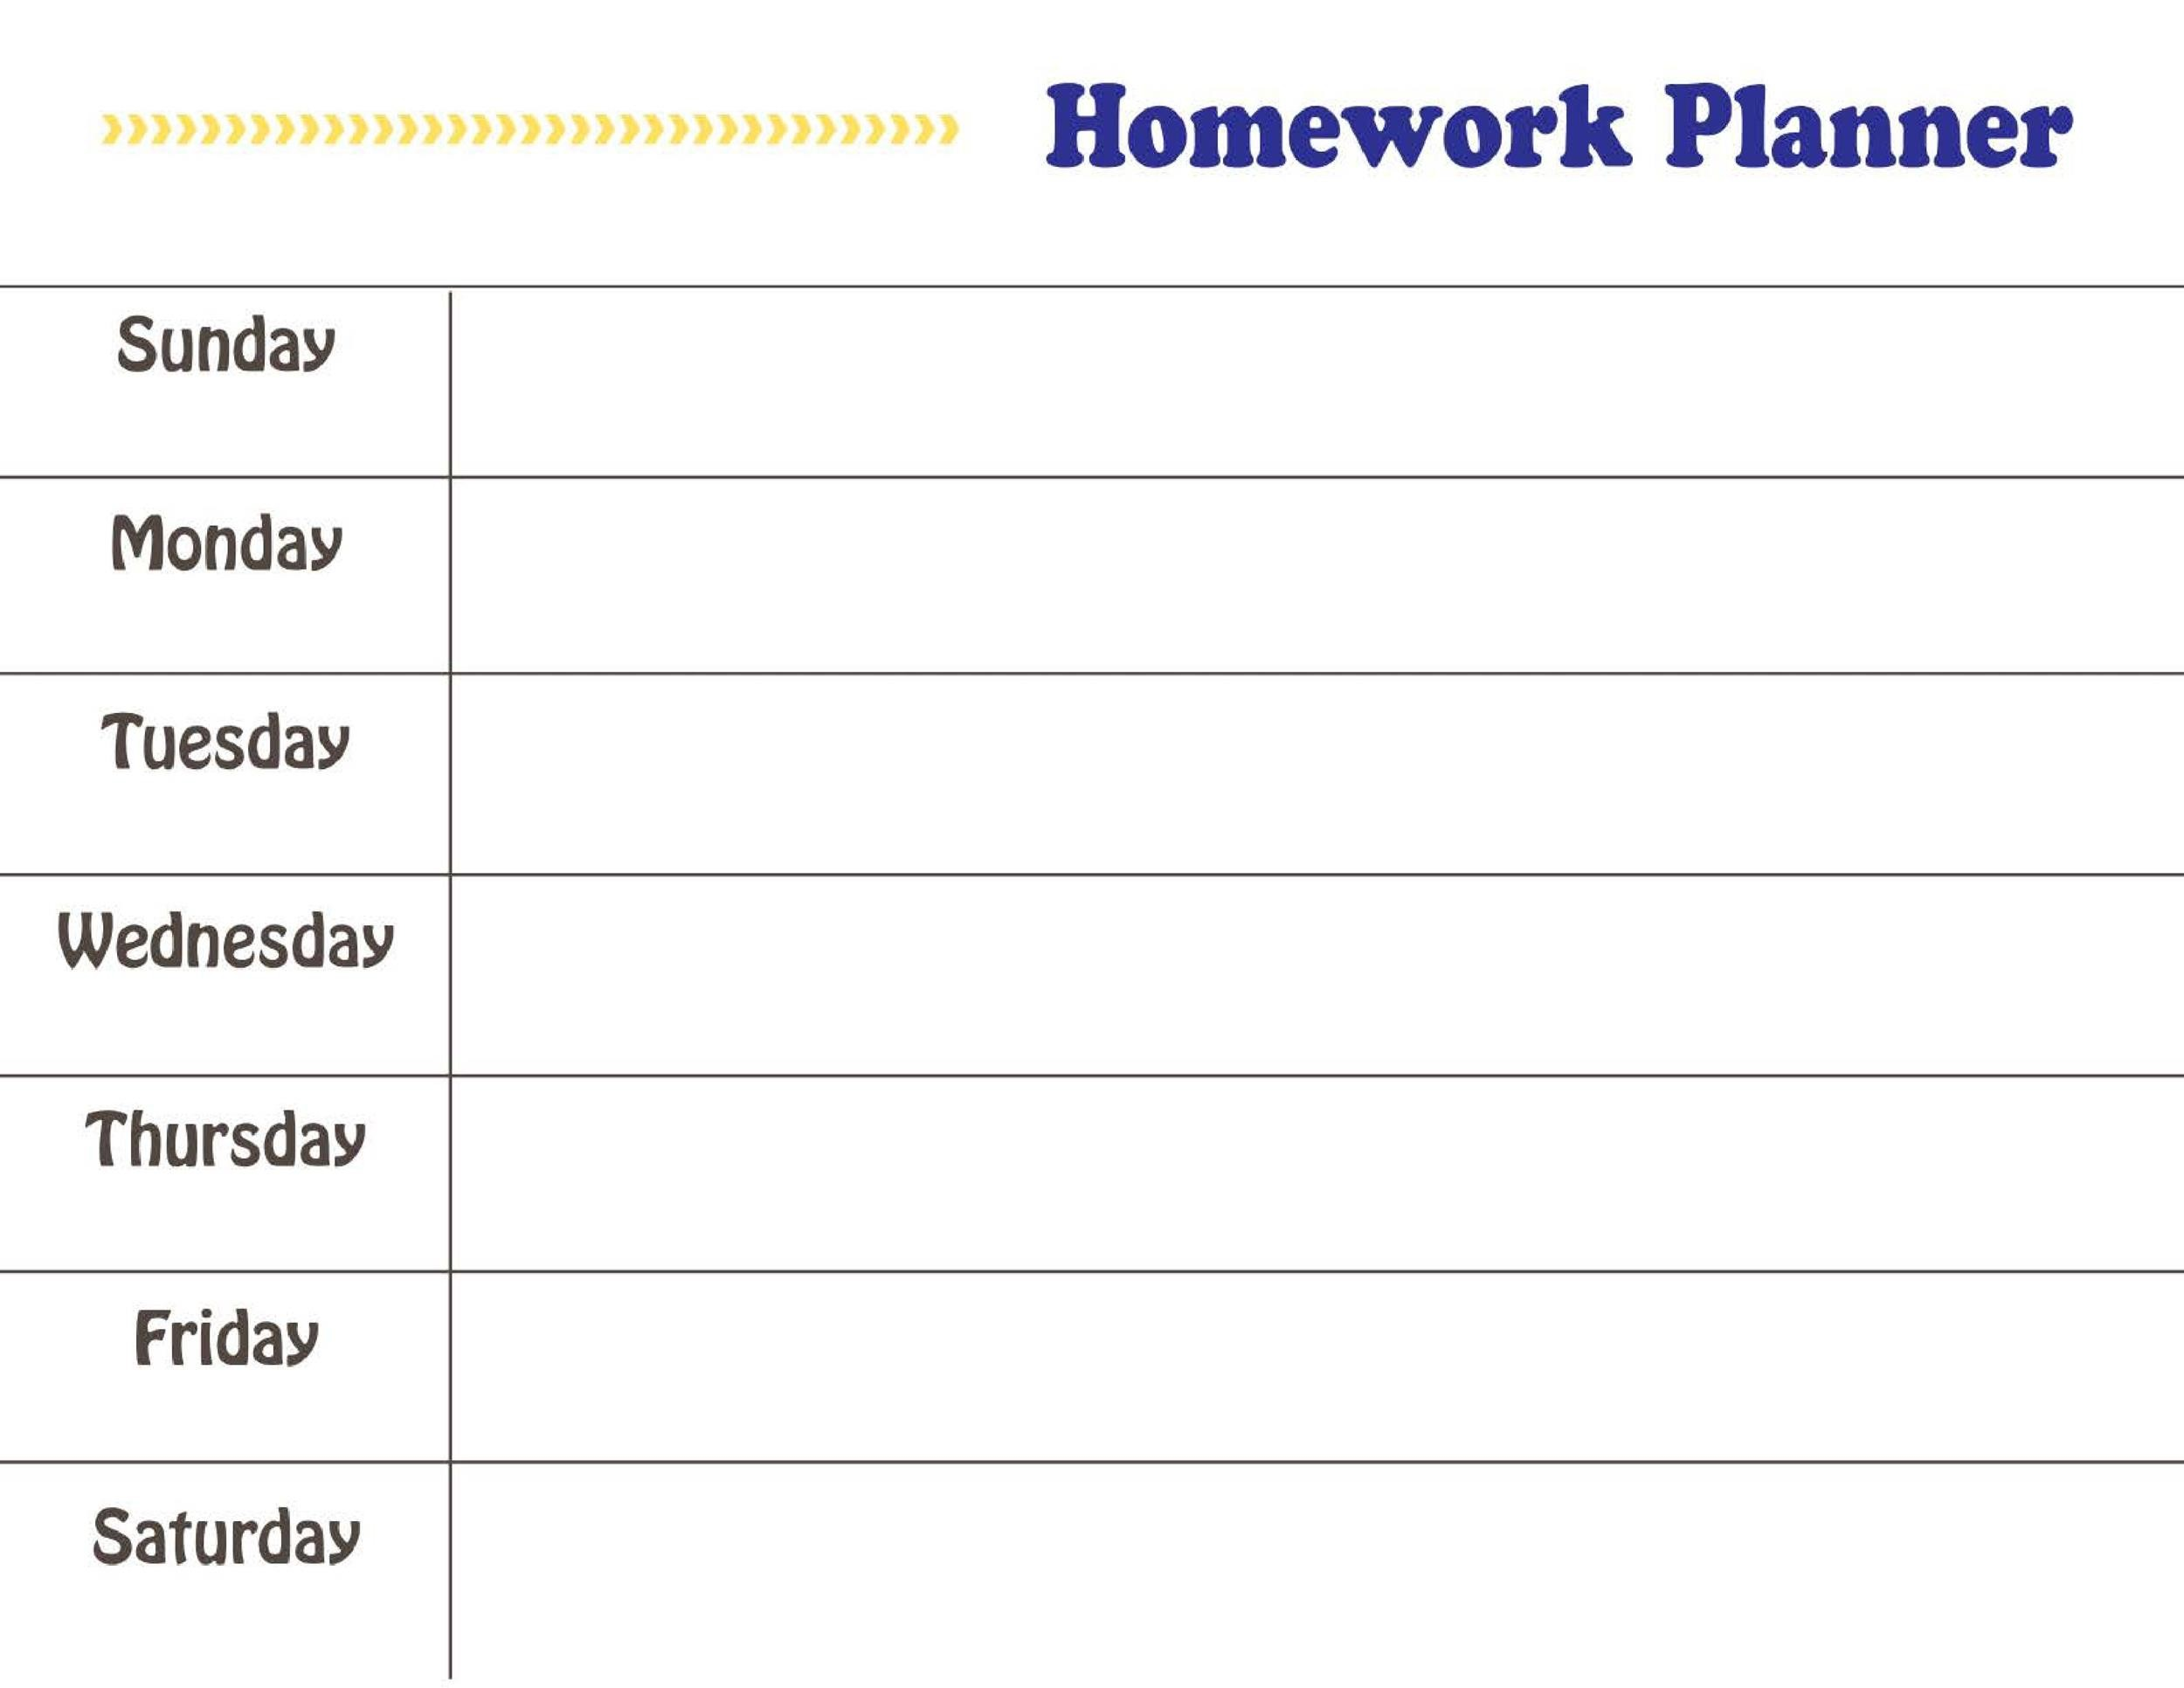 Free homework planner 36